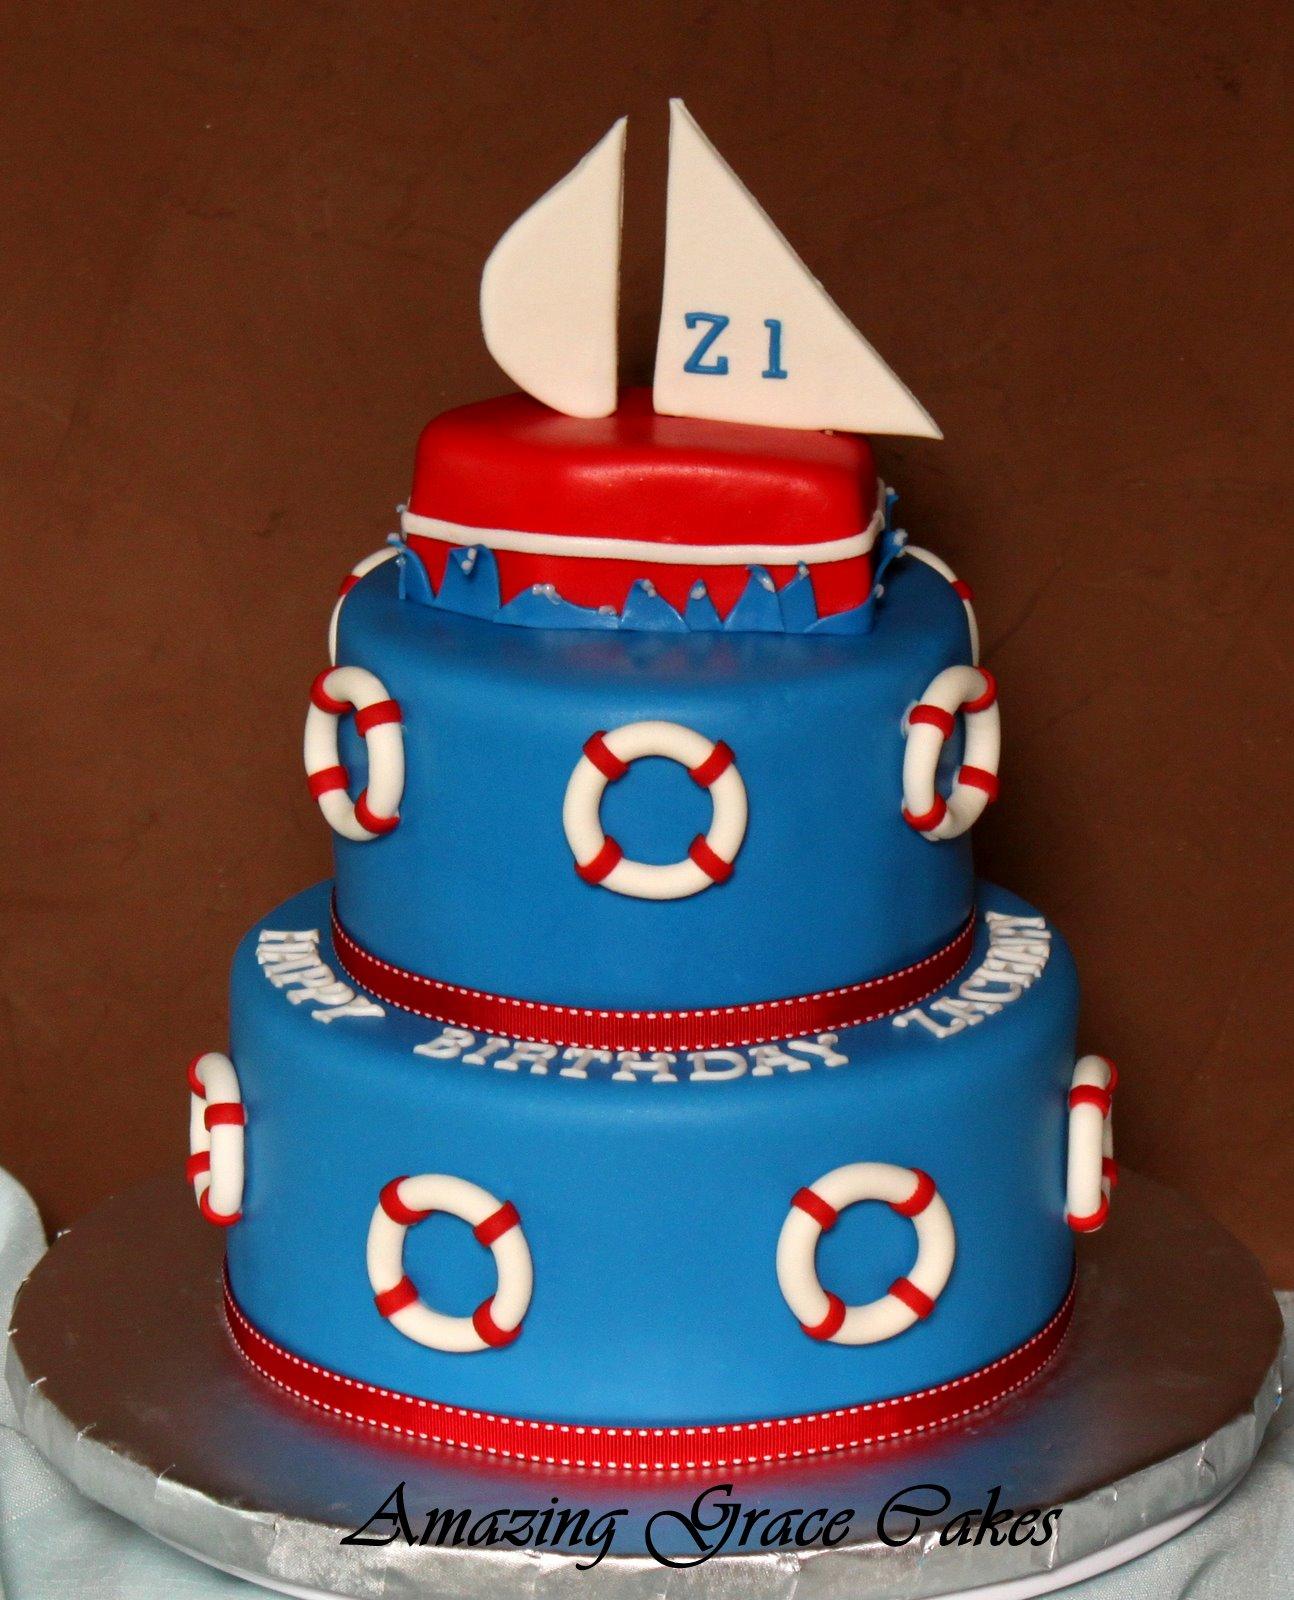 Amazing Grace Cakes: Nautical 1st Birthday